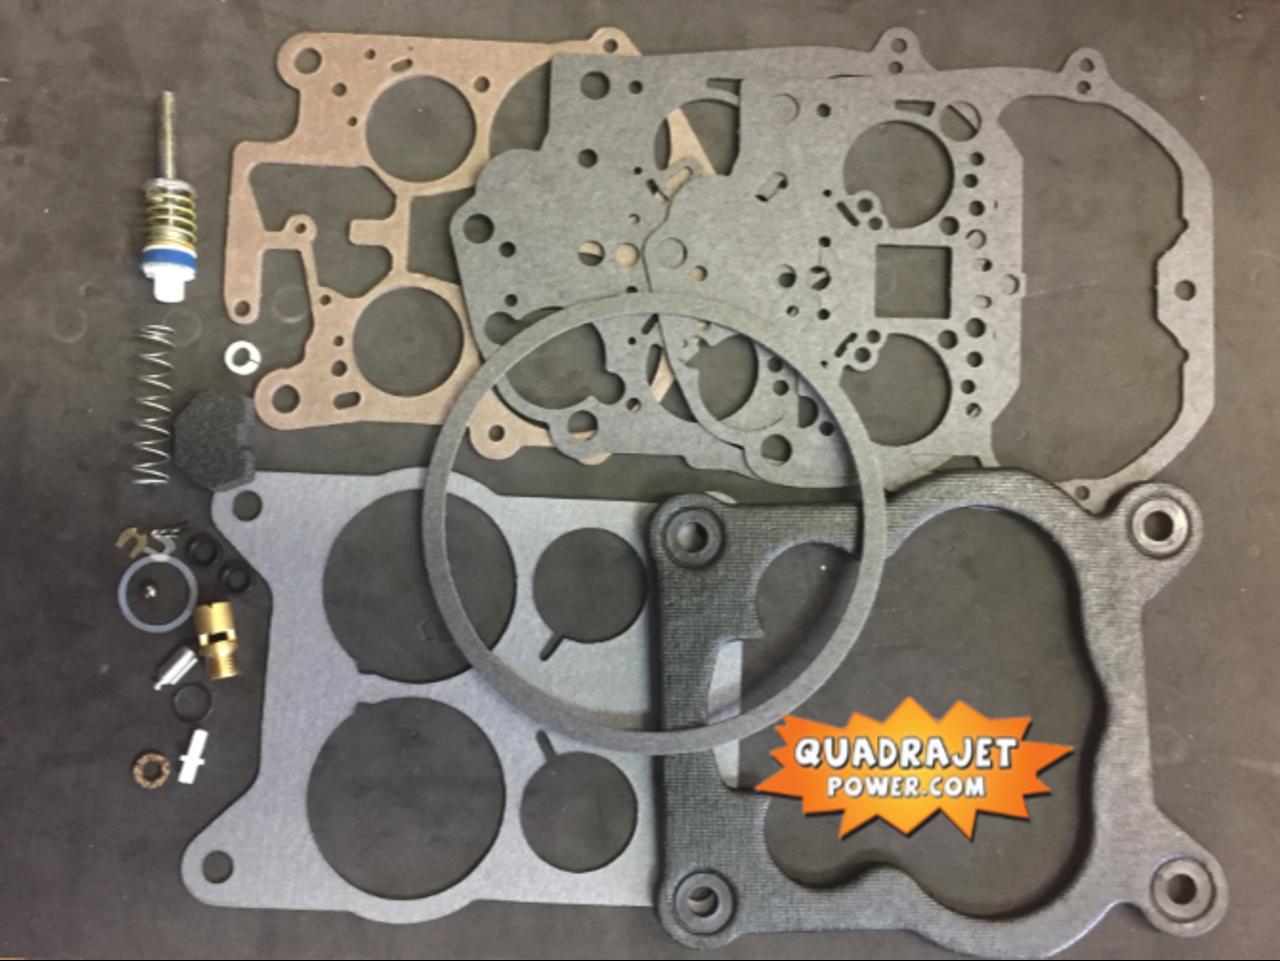 Chevrolet 76-80 Quadrajet Rebuild Kit Chevy GMC truck 80-89 Best Kit Available